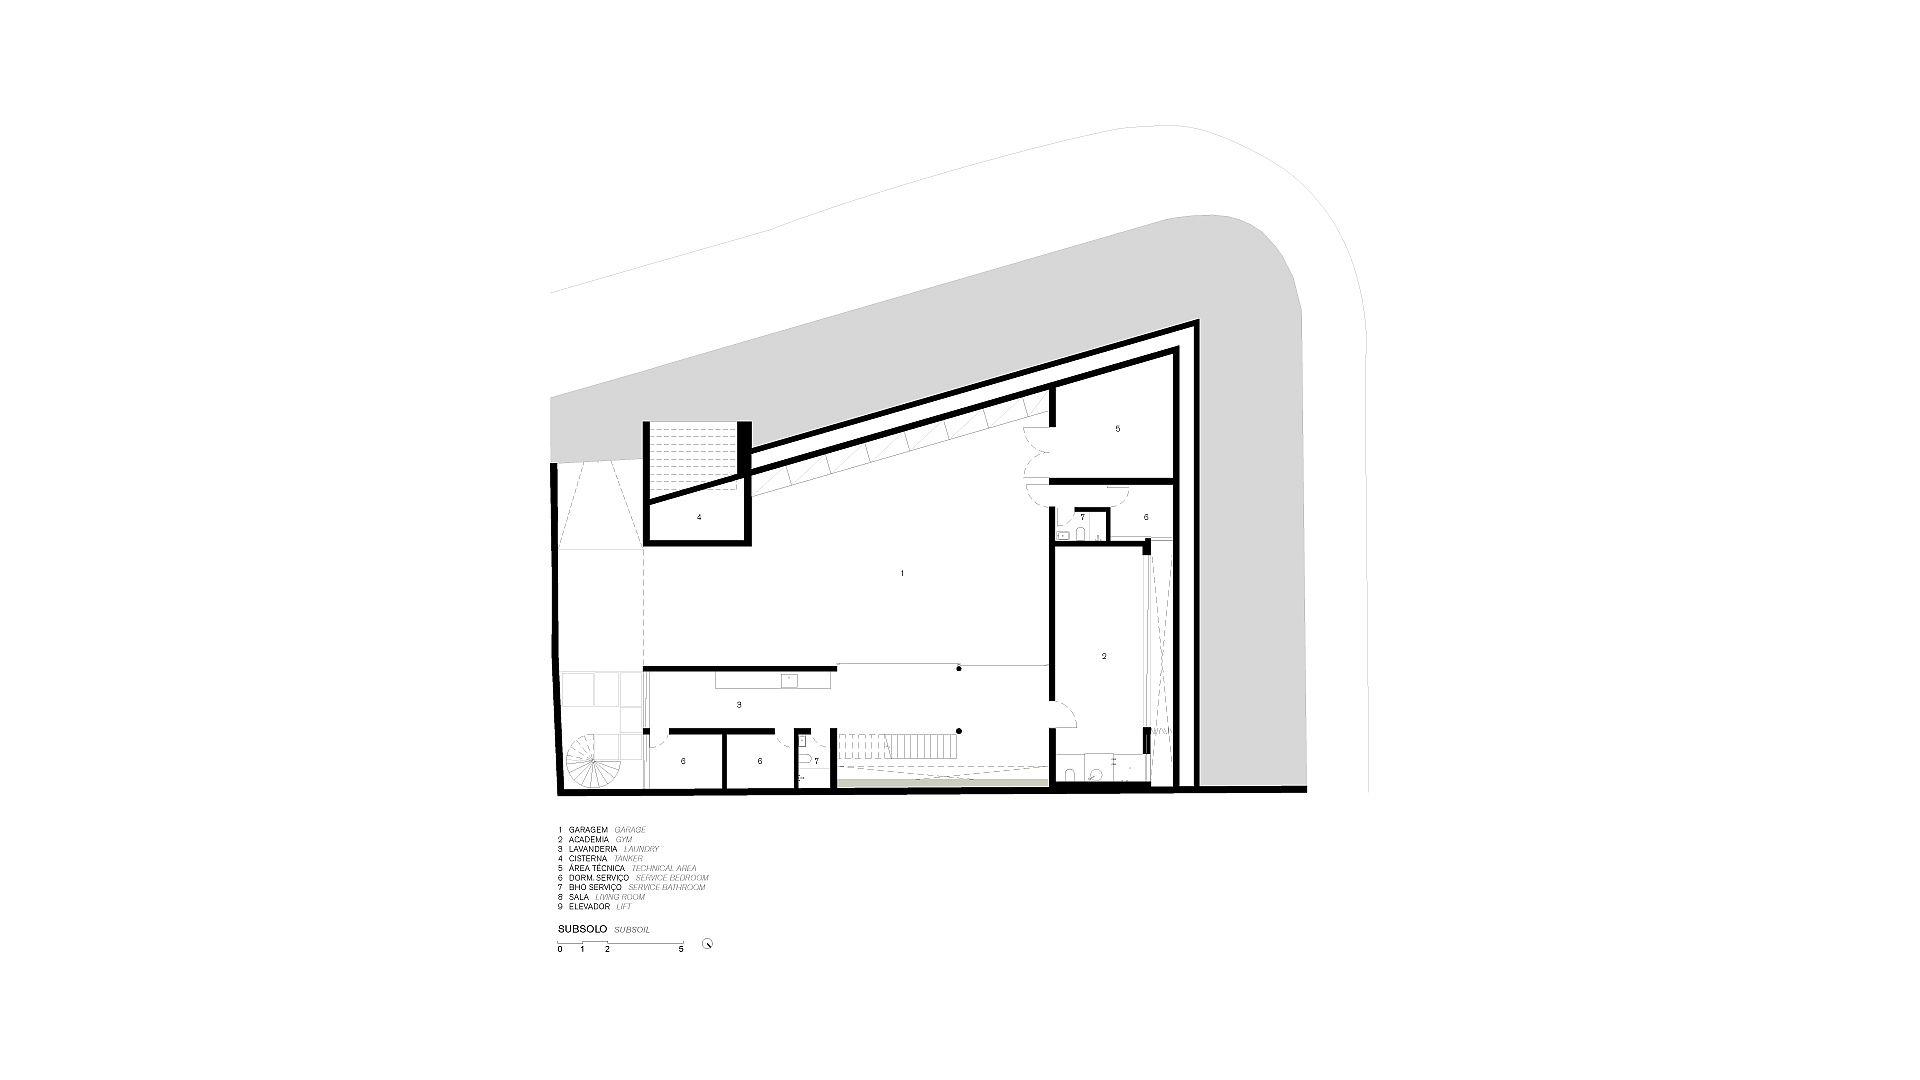 Underground-level-floor-plan-of-JZL-House